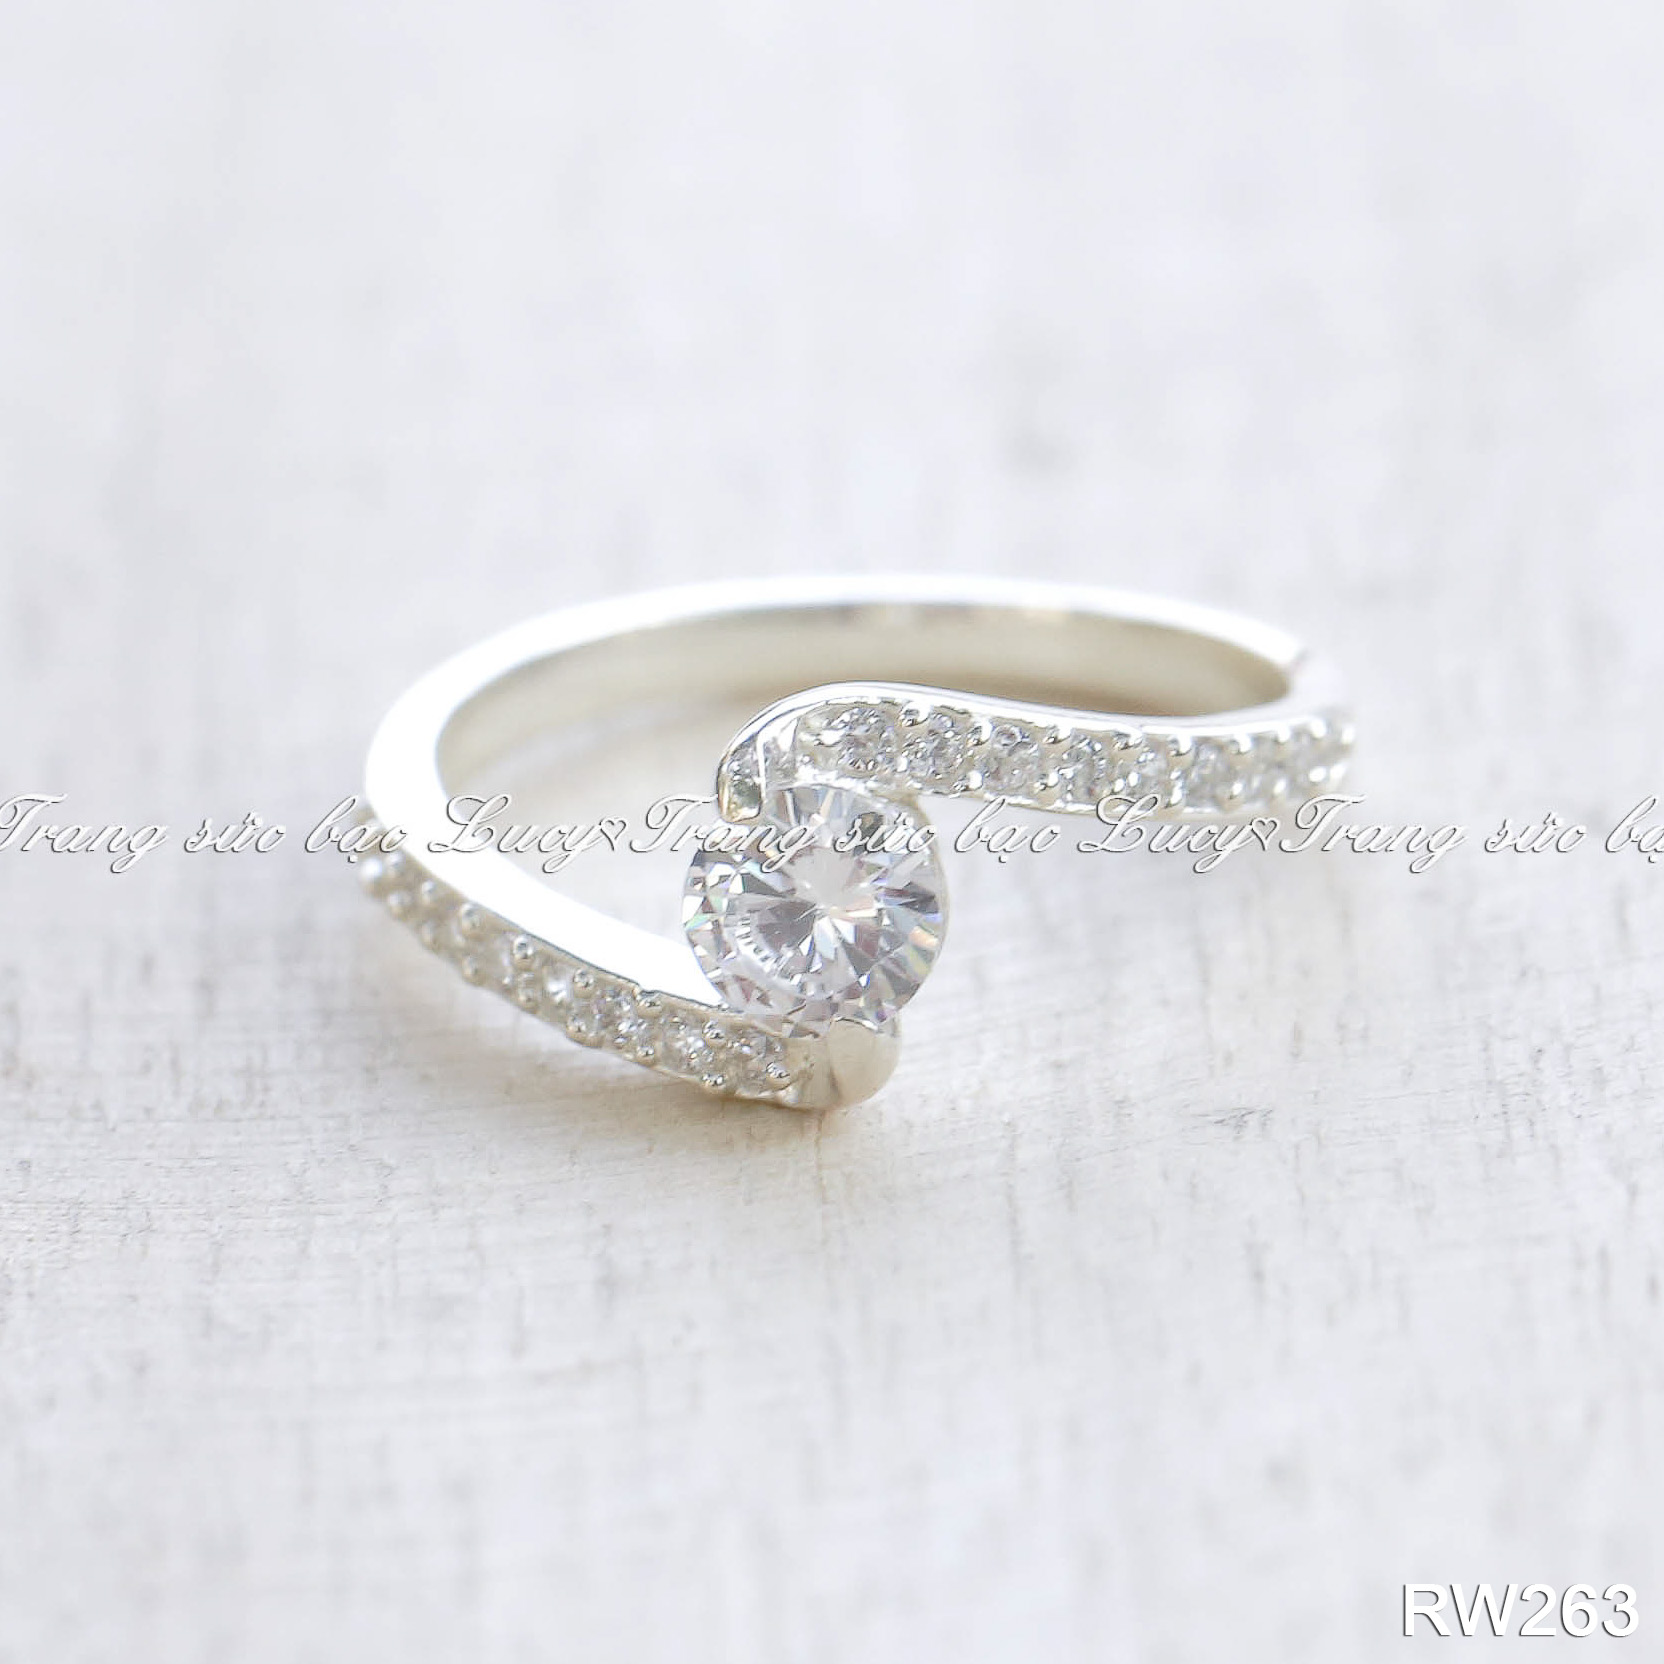 nhẫn nữ bạc lucy - rw263